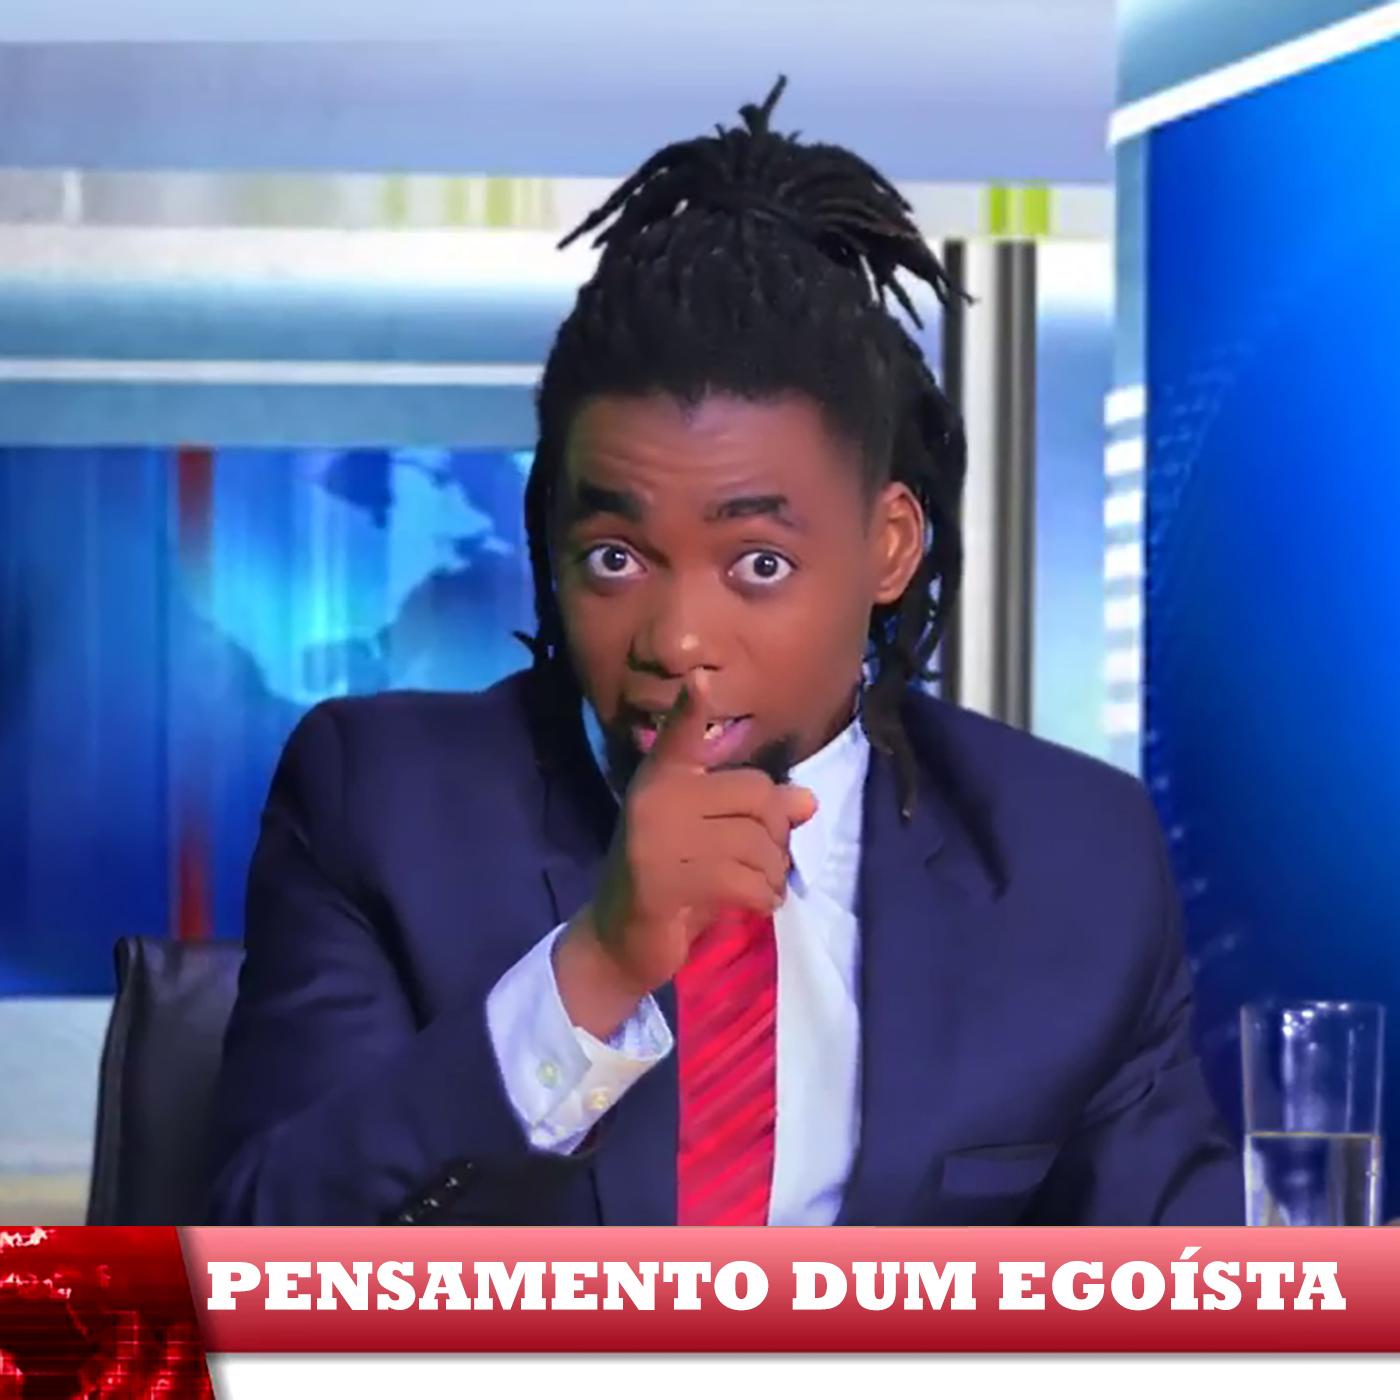 Post Malone Better Now Baixar Mp3: Pensamento Dum Egoísta (2018) [Download